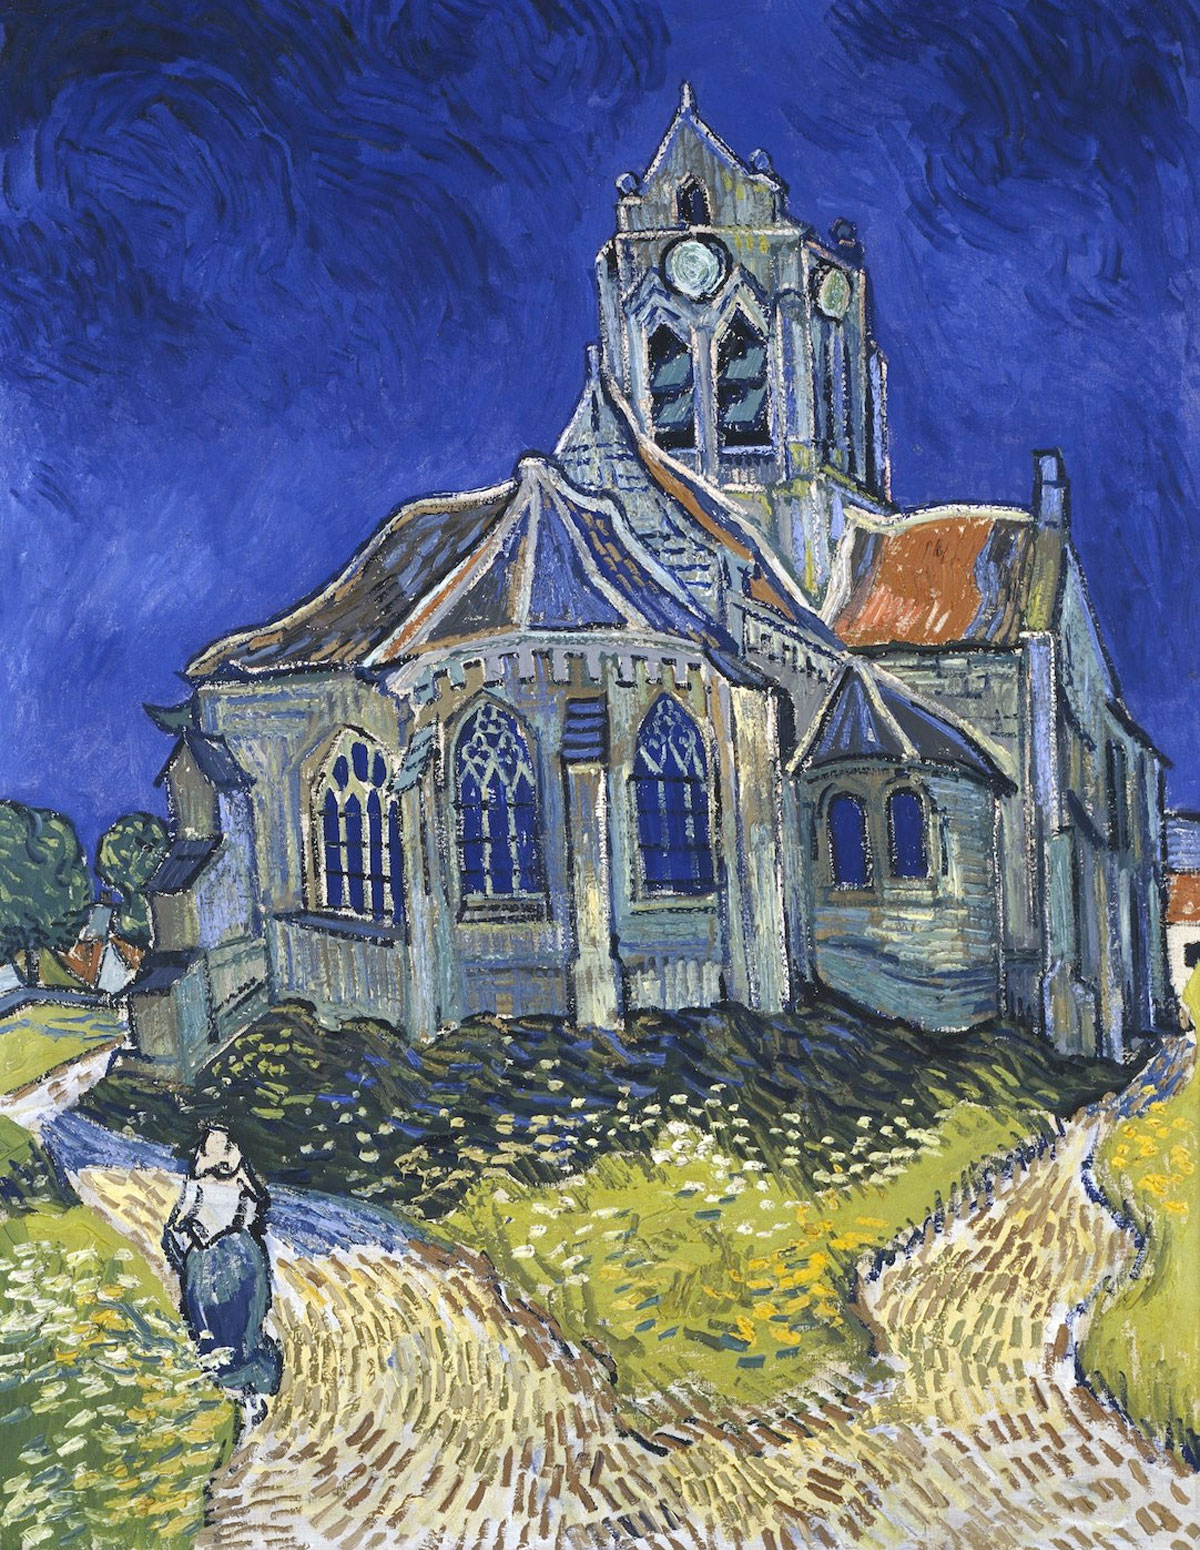 La chiesa di Auvers-sur-Oise, veduta dalla parte absidale: quadro di Vincent Van Gogh